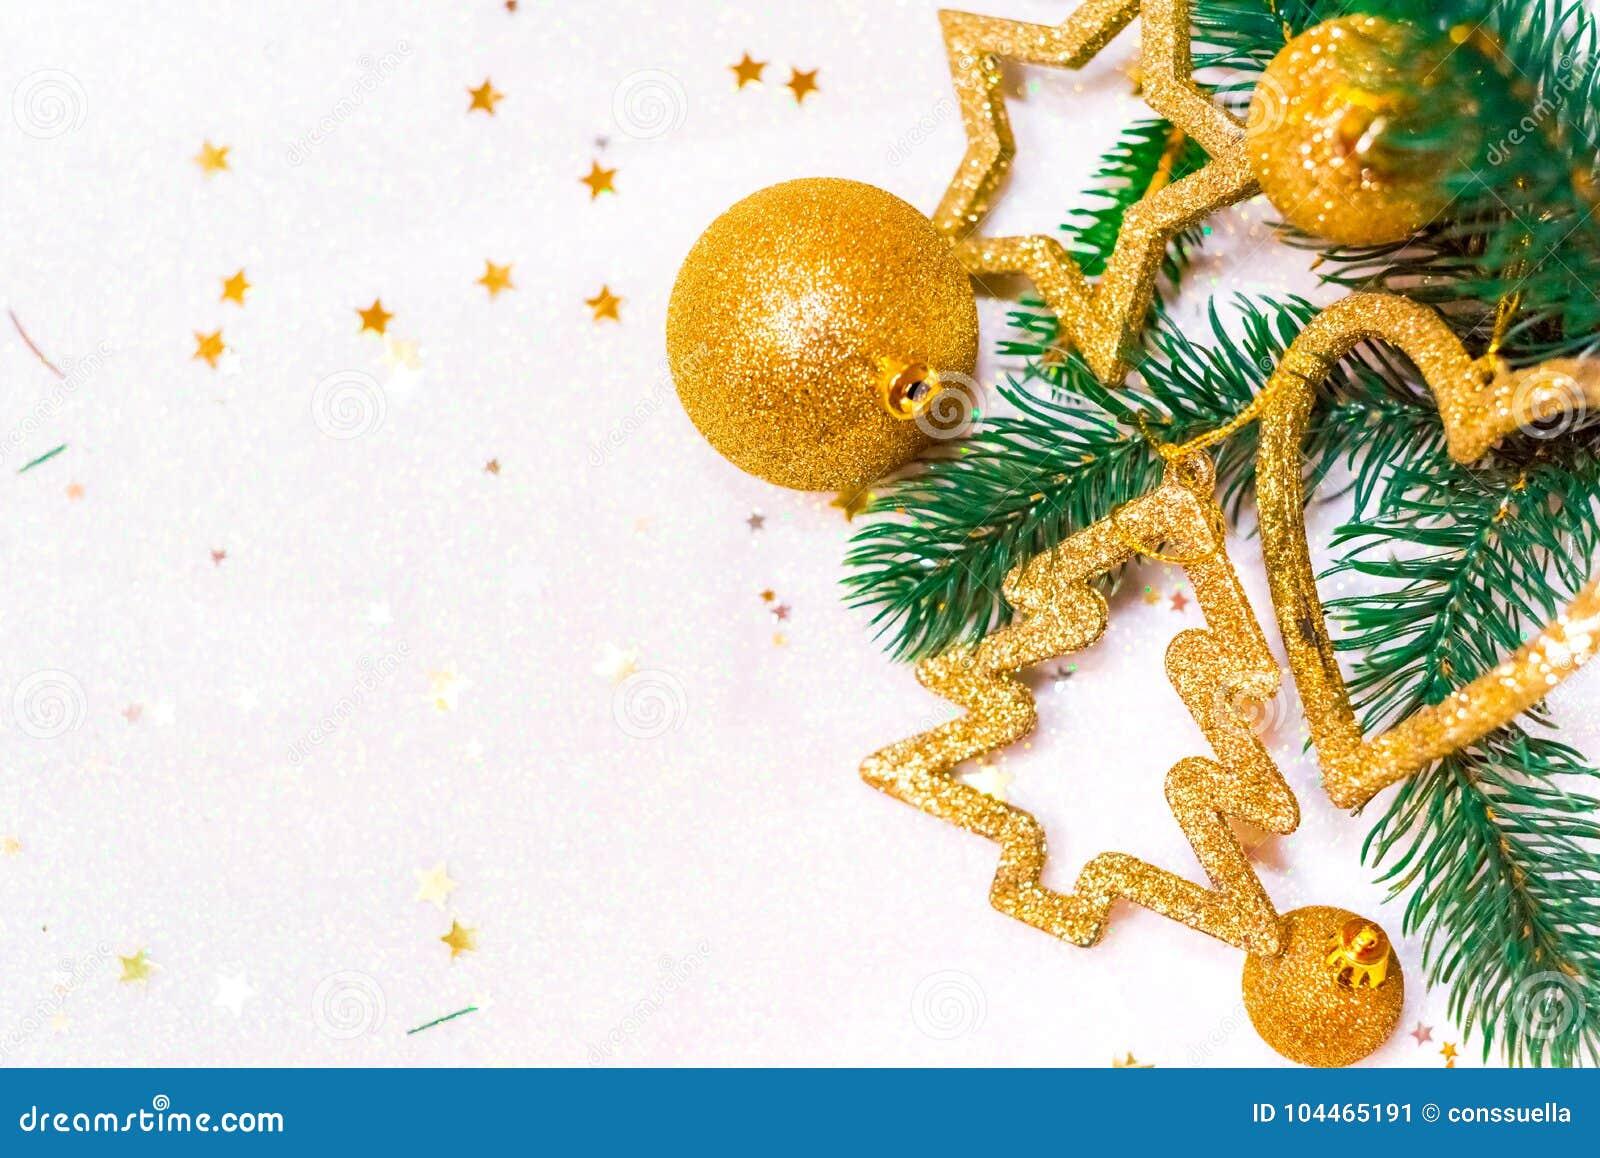 Christmas Ornaments, With Christmas Balls, Stars, Gold And ...